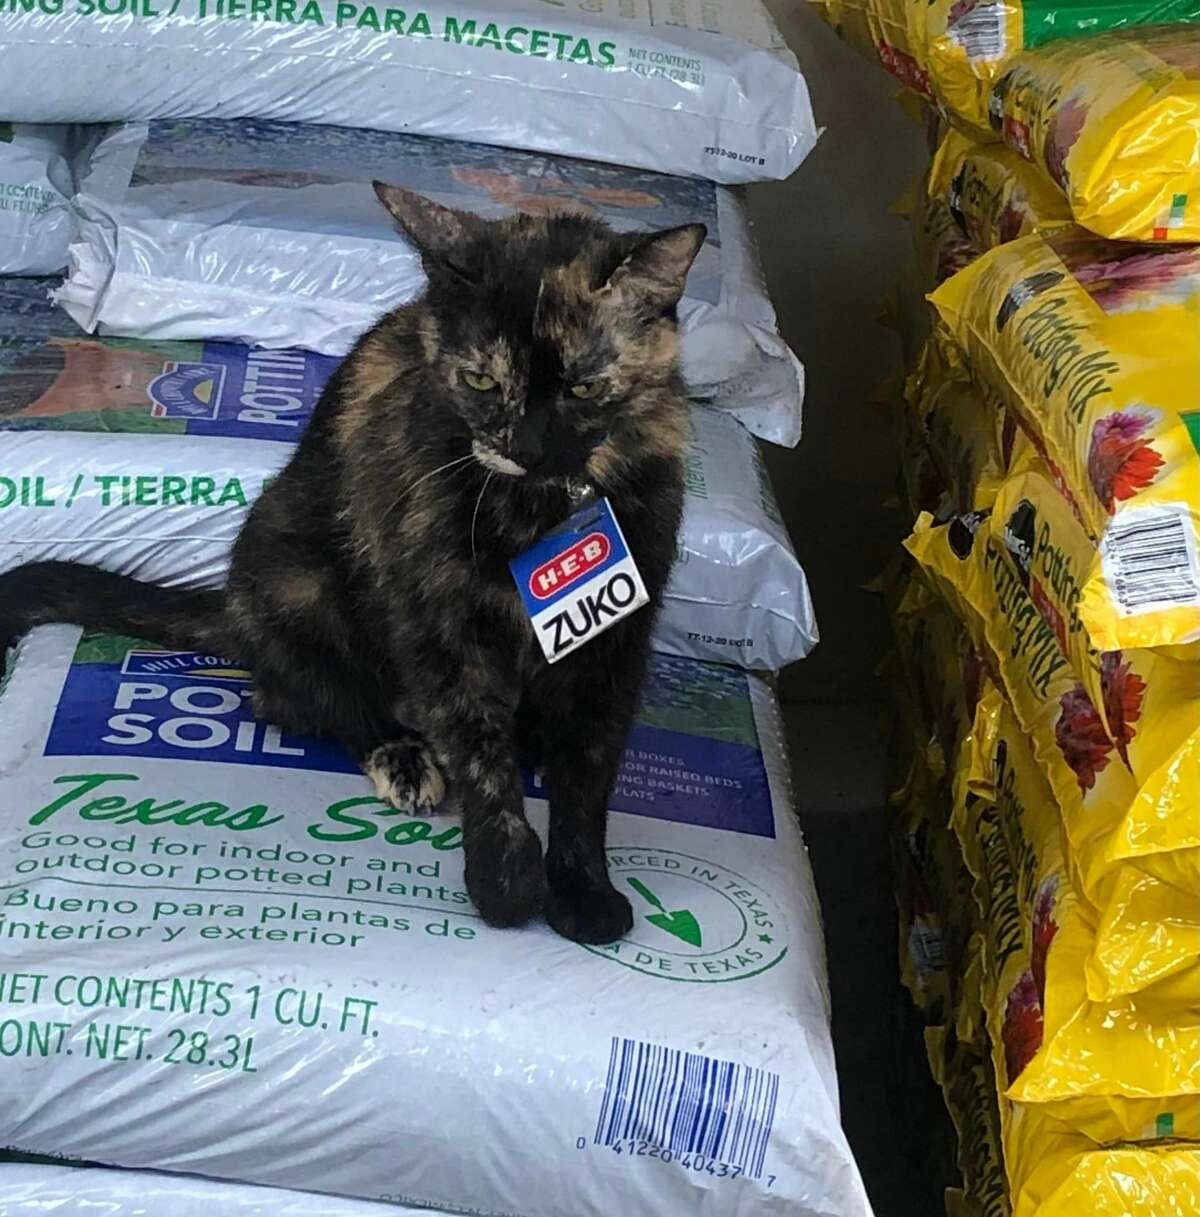 San Antonio shoppers, meet Zuko - H-E-B's cutest partner (who happens to be a precious stray cat).